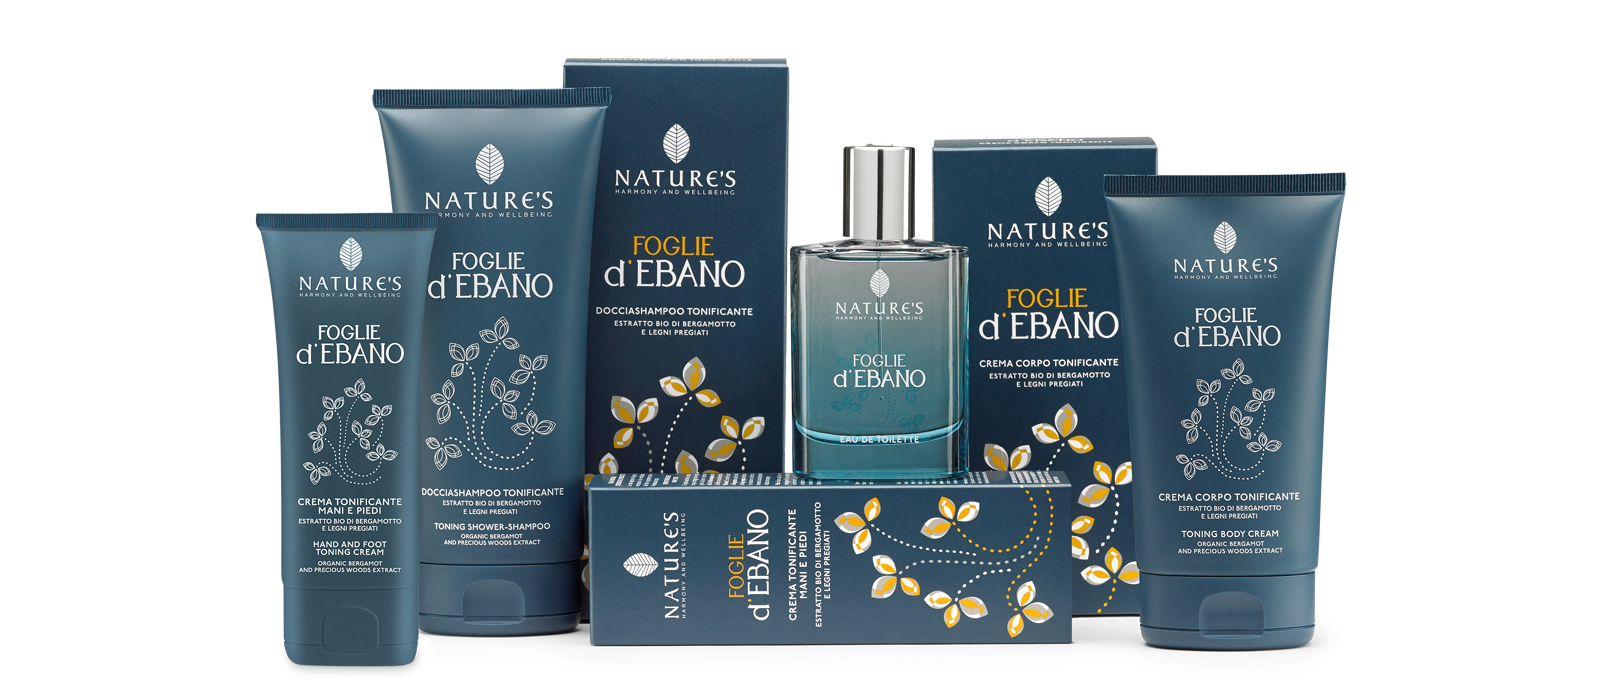 Foglie d'Ebano Linea Nature's